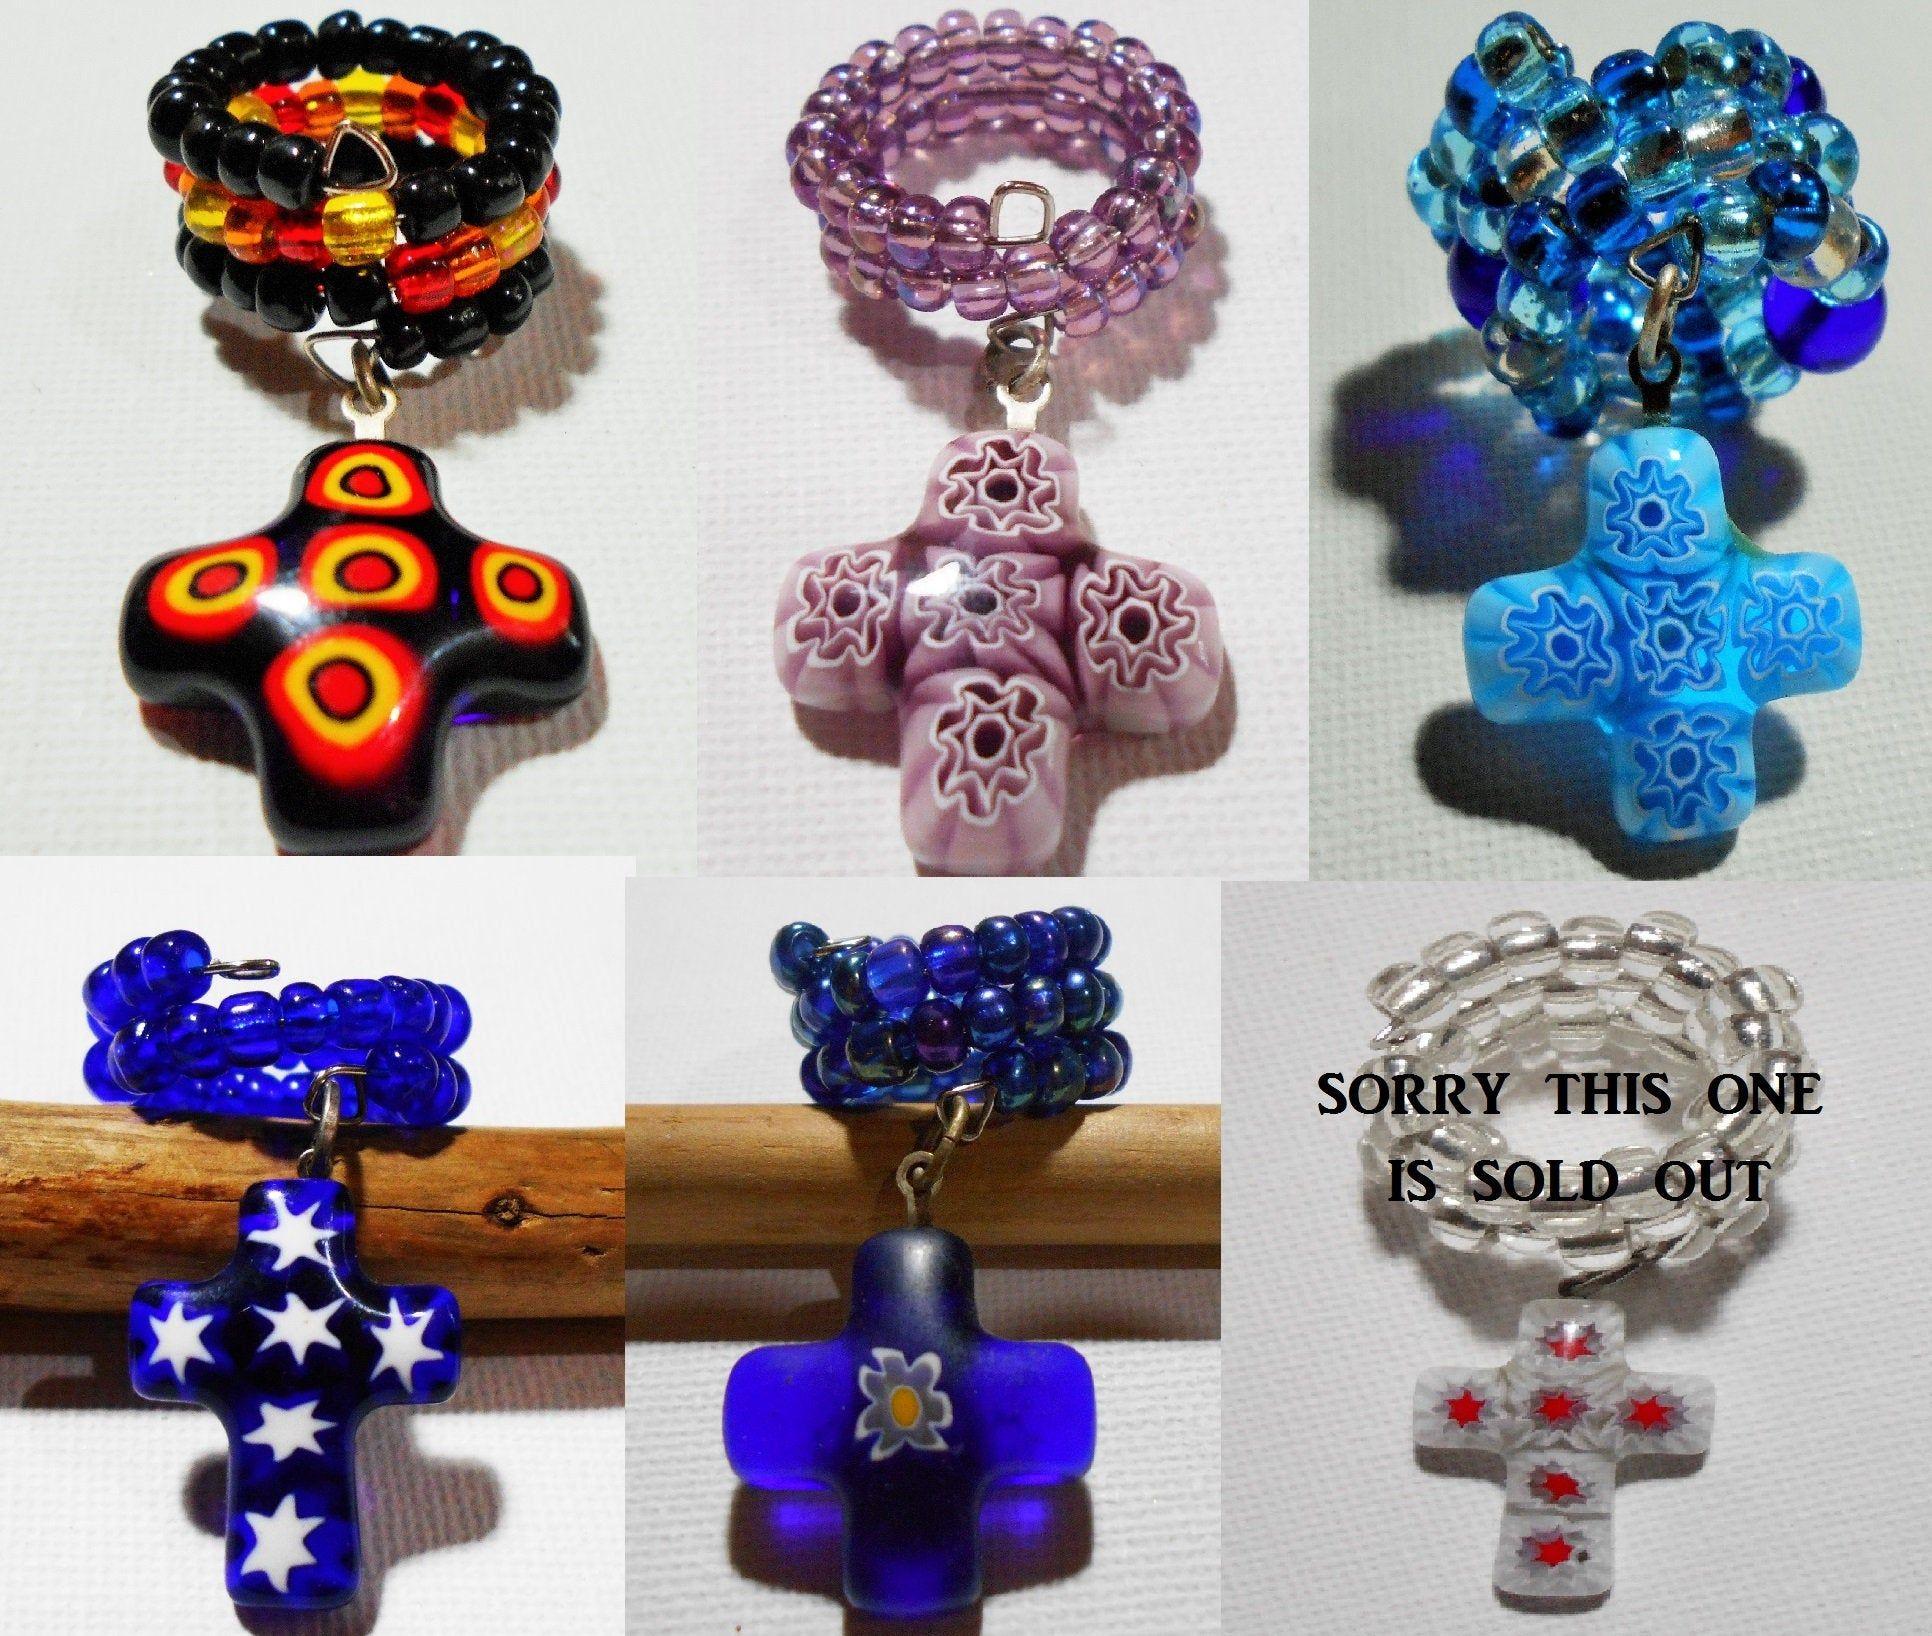 Dreadlocks Wood Dread Bead 6 Large Hole Hair Beads Dread Beads Big Hole Loc Bead Hair Jewellery Wooden Dreadlock Jewelry